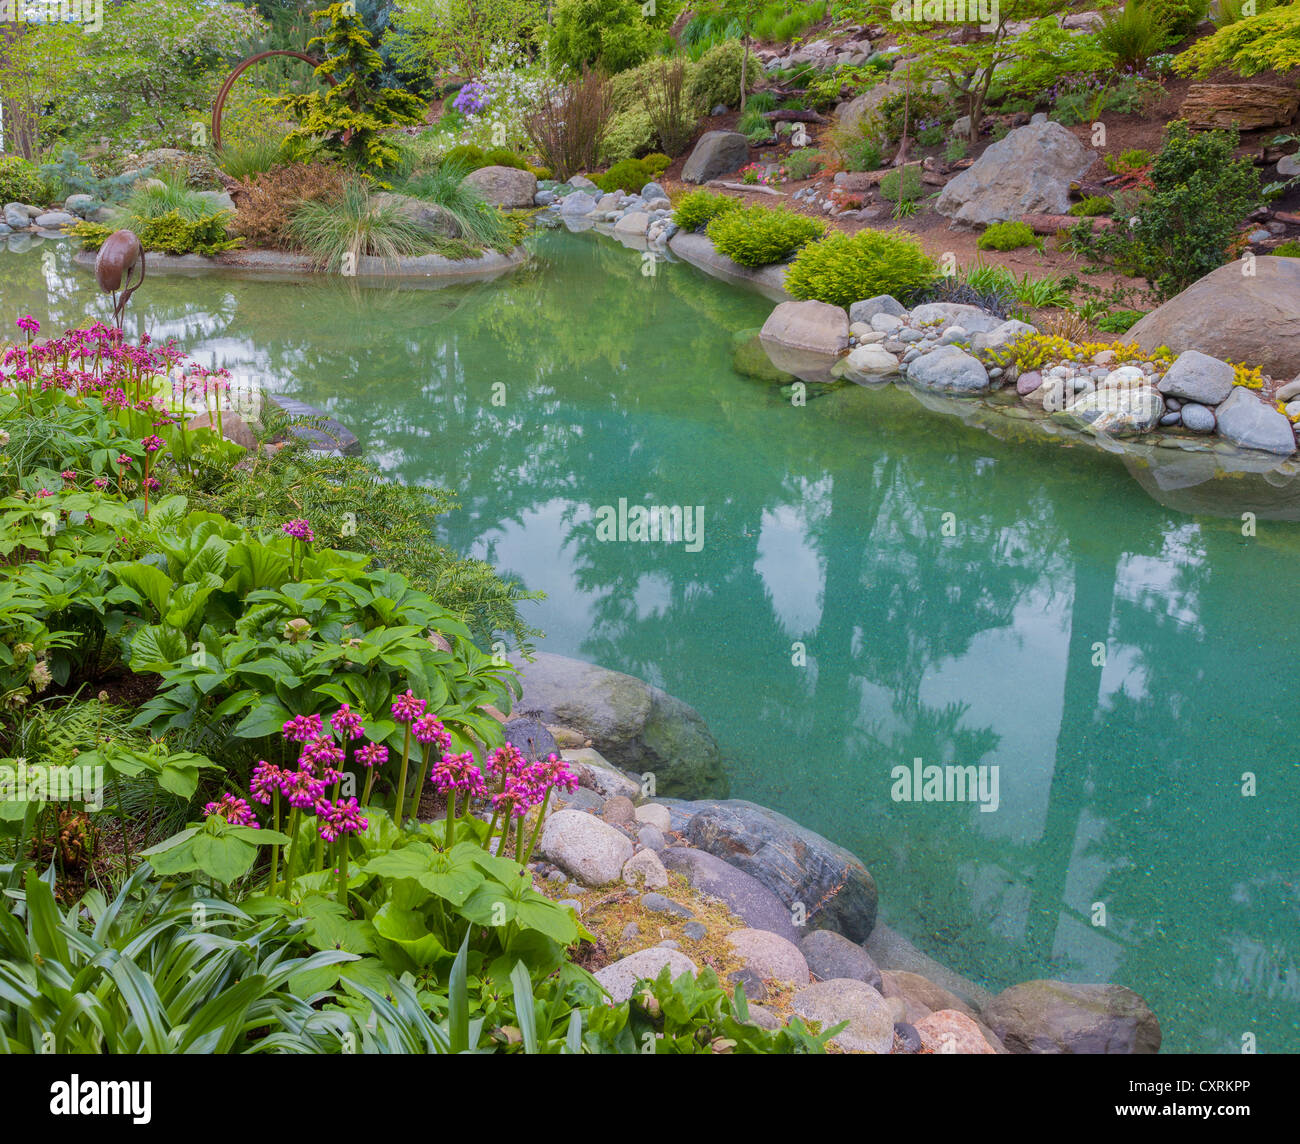 Vashon-Maury Island, WA: Salt water plunge pool surrounded by woodland perennial garden - Stock Image